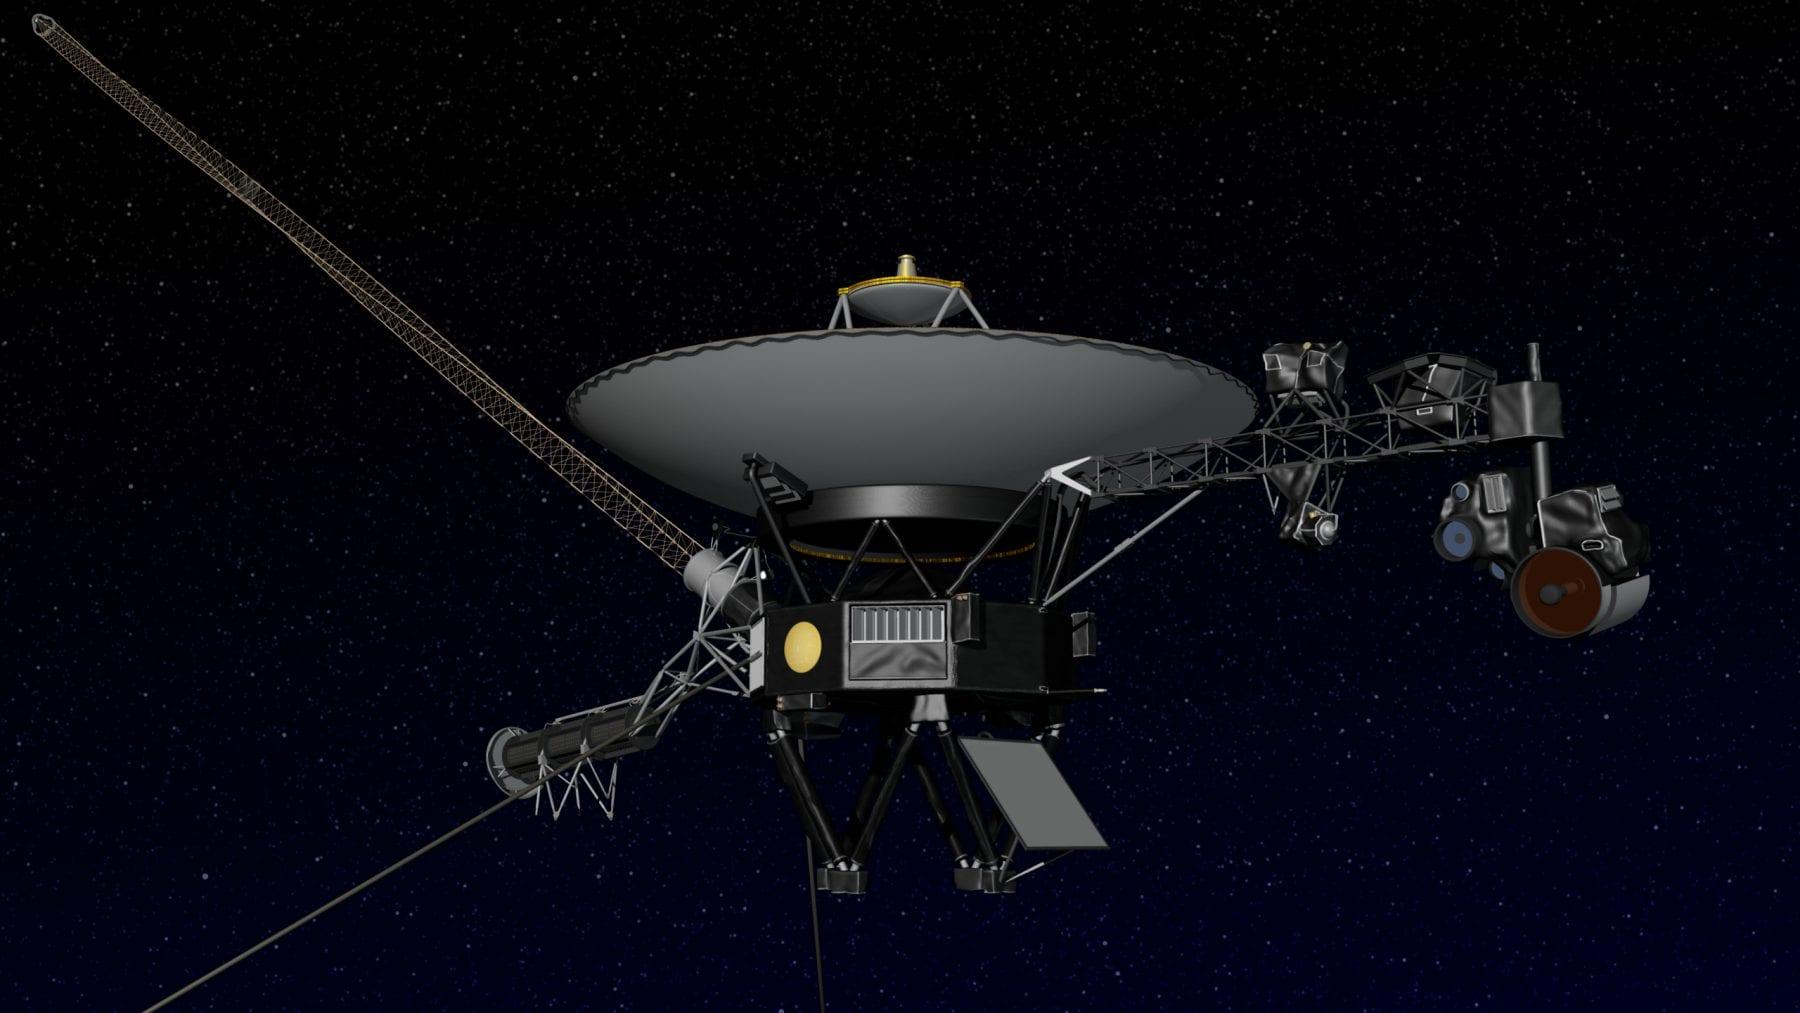 Artist's concept of NASA's Voyager spacecraft in space. Credit: NASA/JPL-Caltech